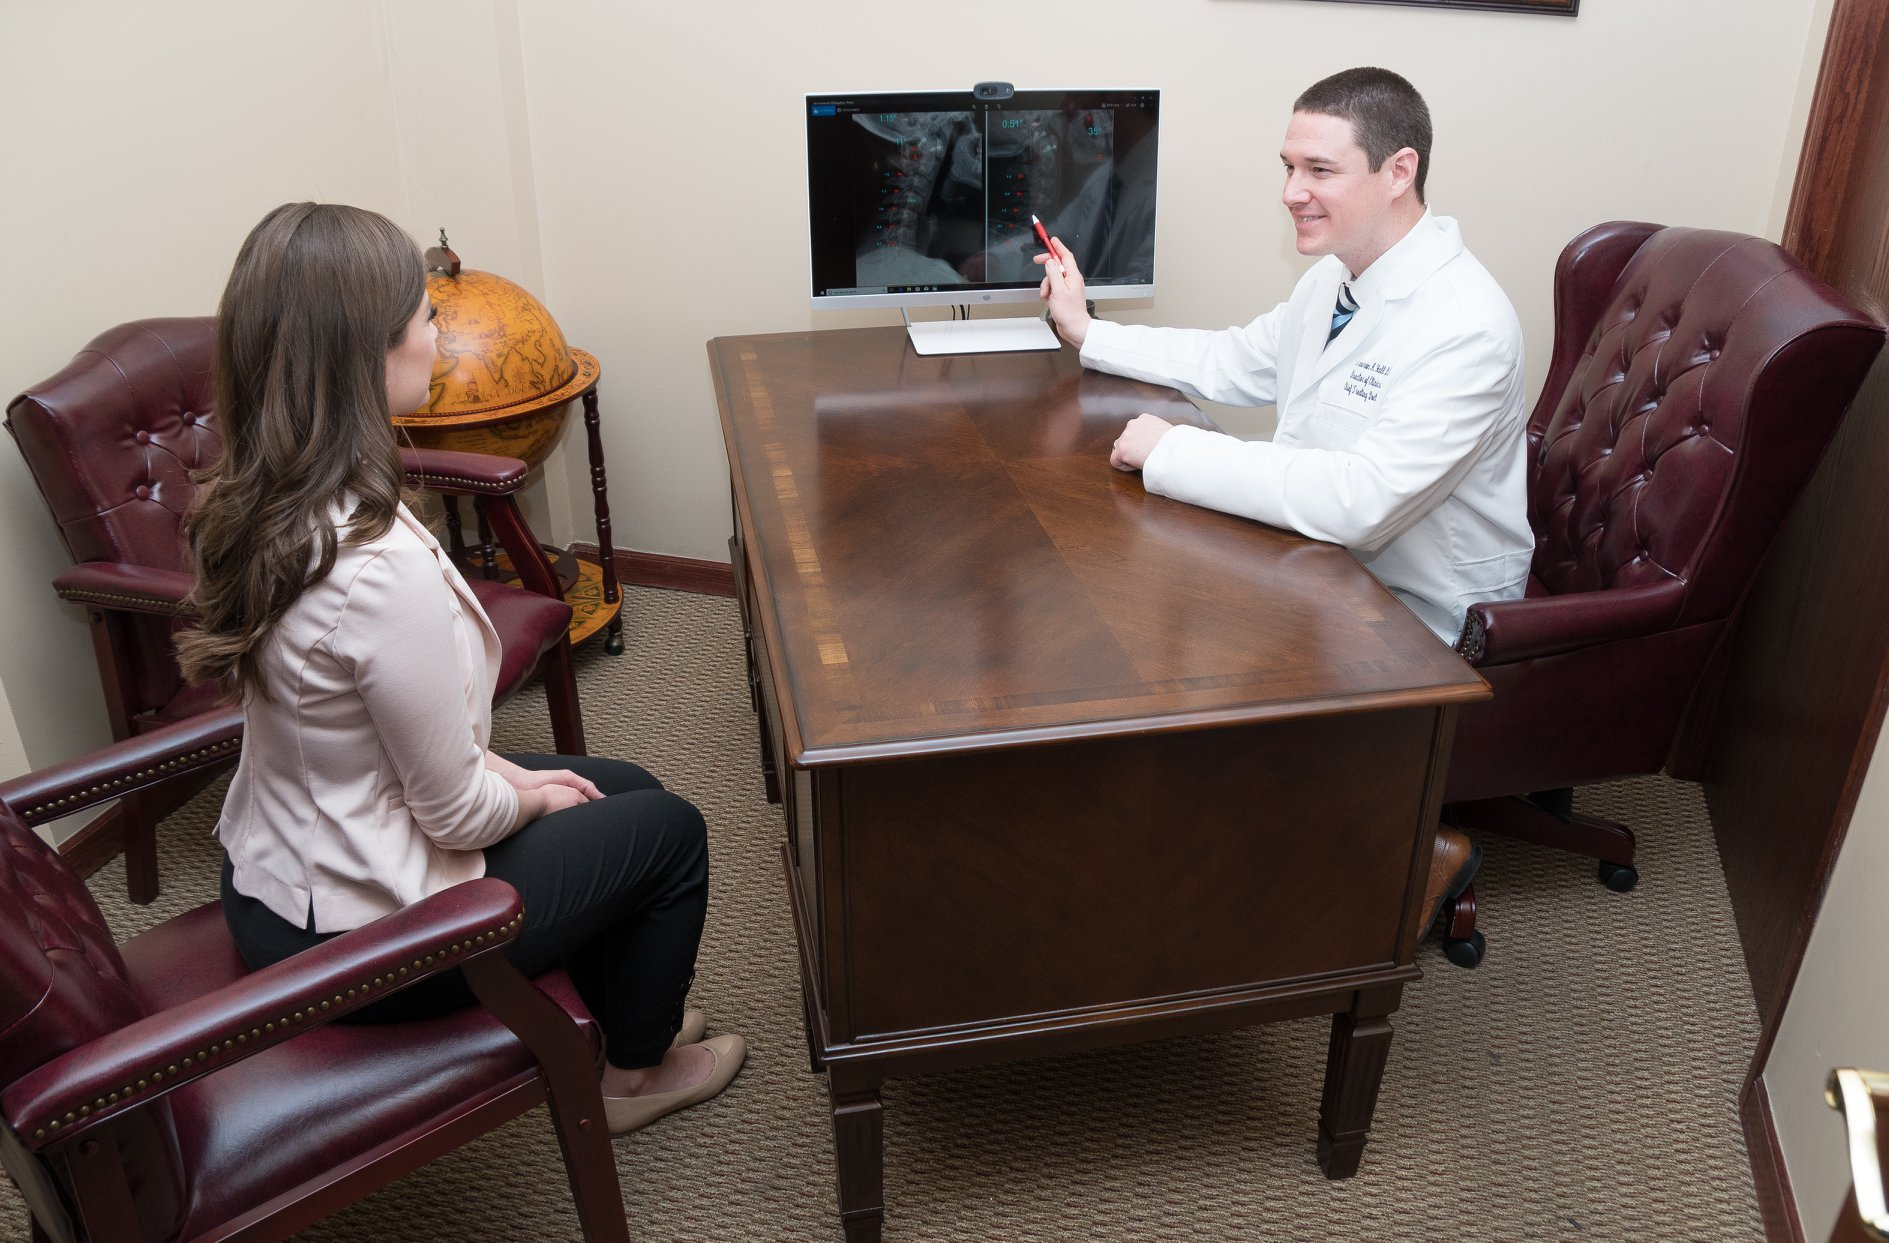 Dr. Hall premier laser fat loss center